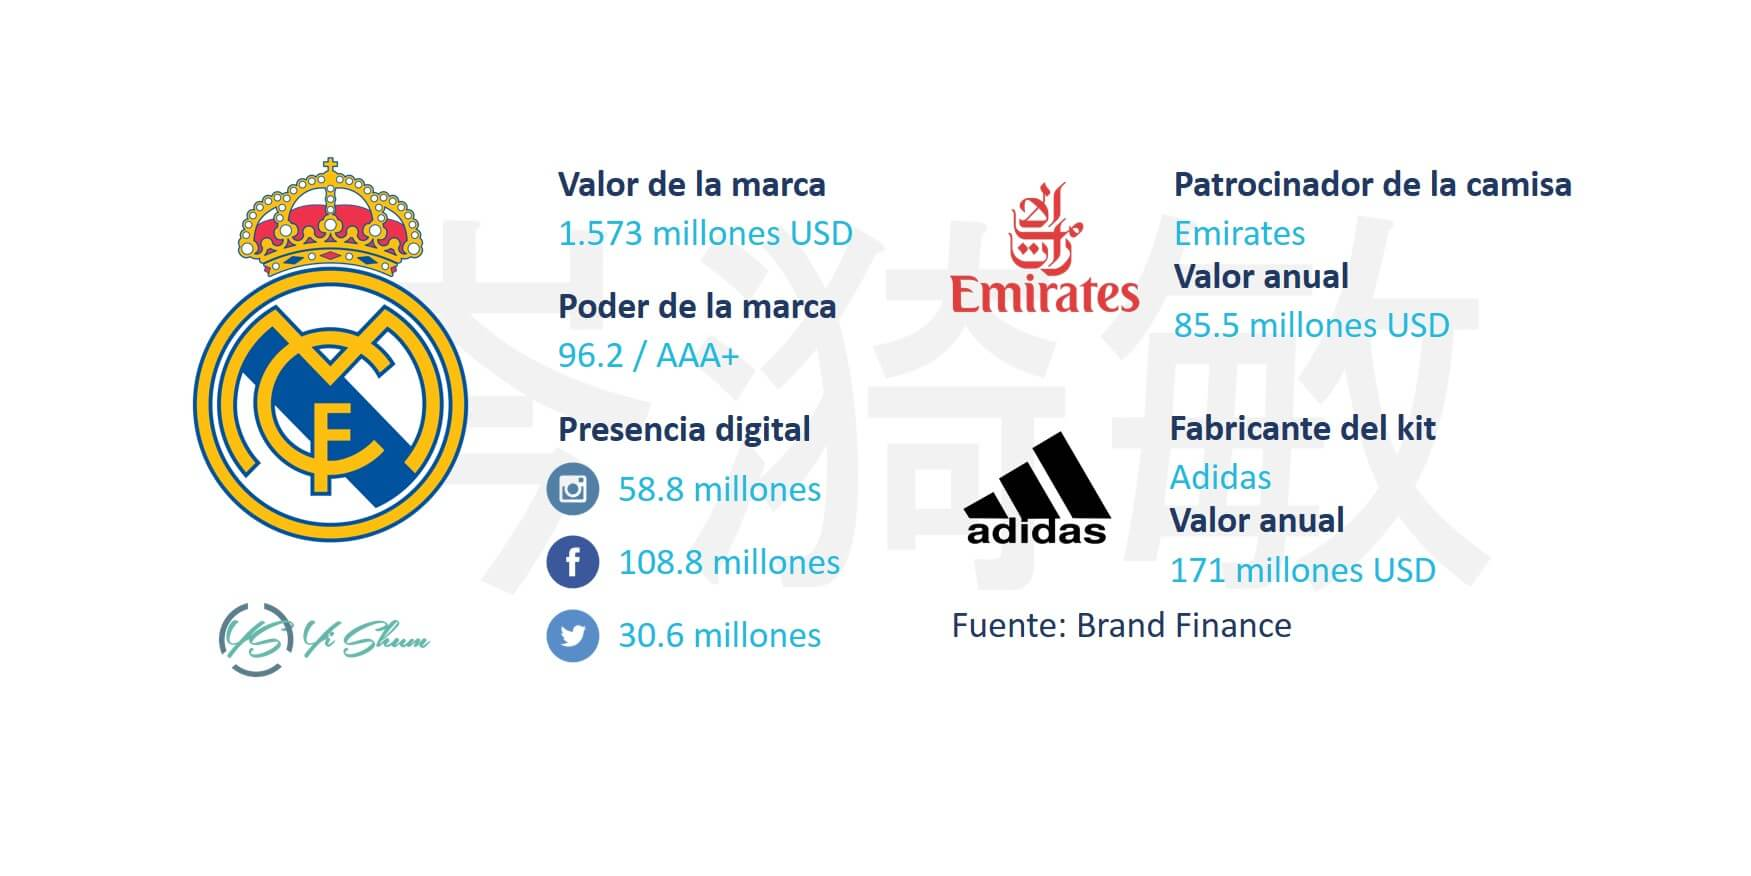 Real Madrid - Ficha técnico imagen